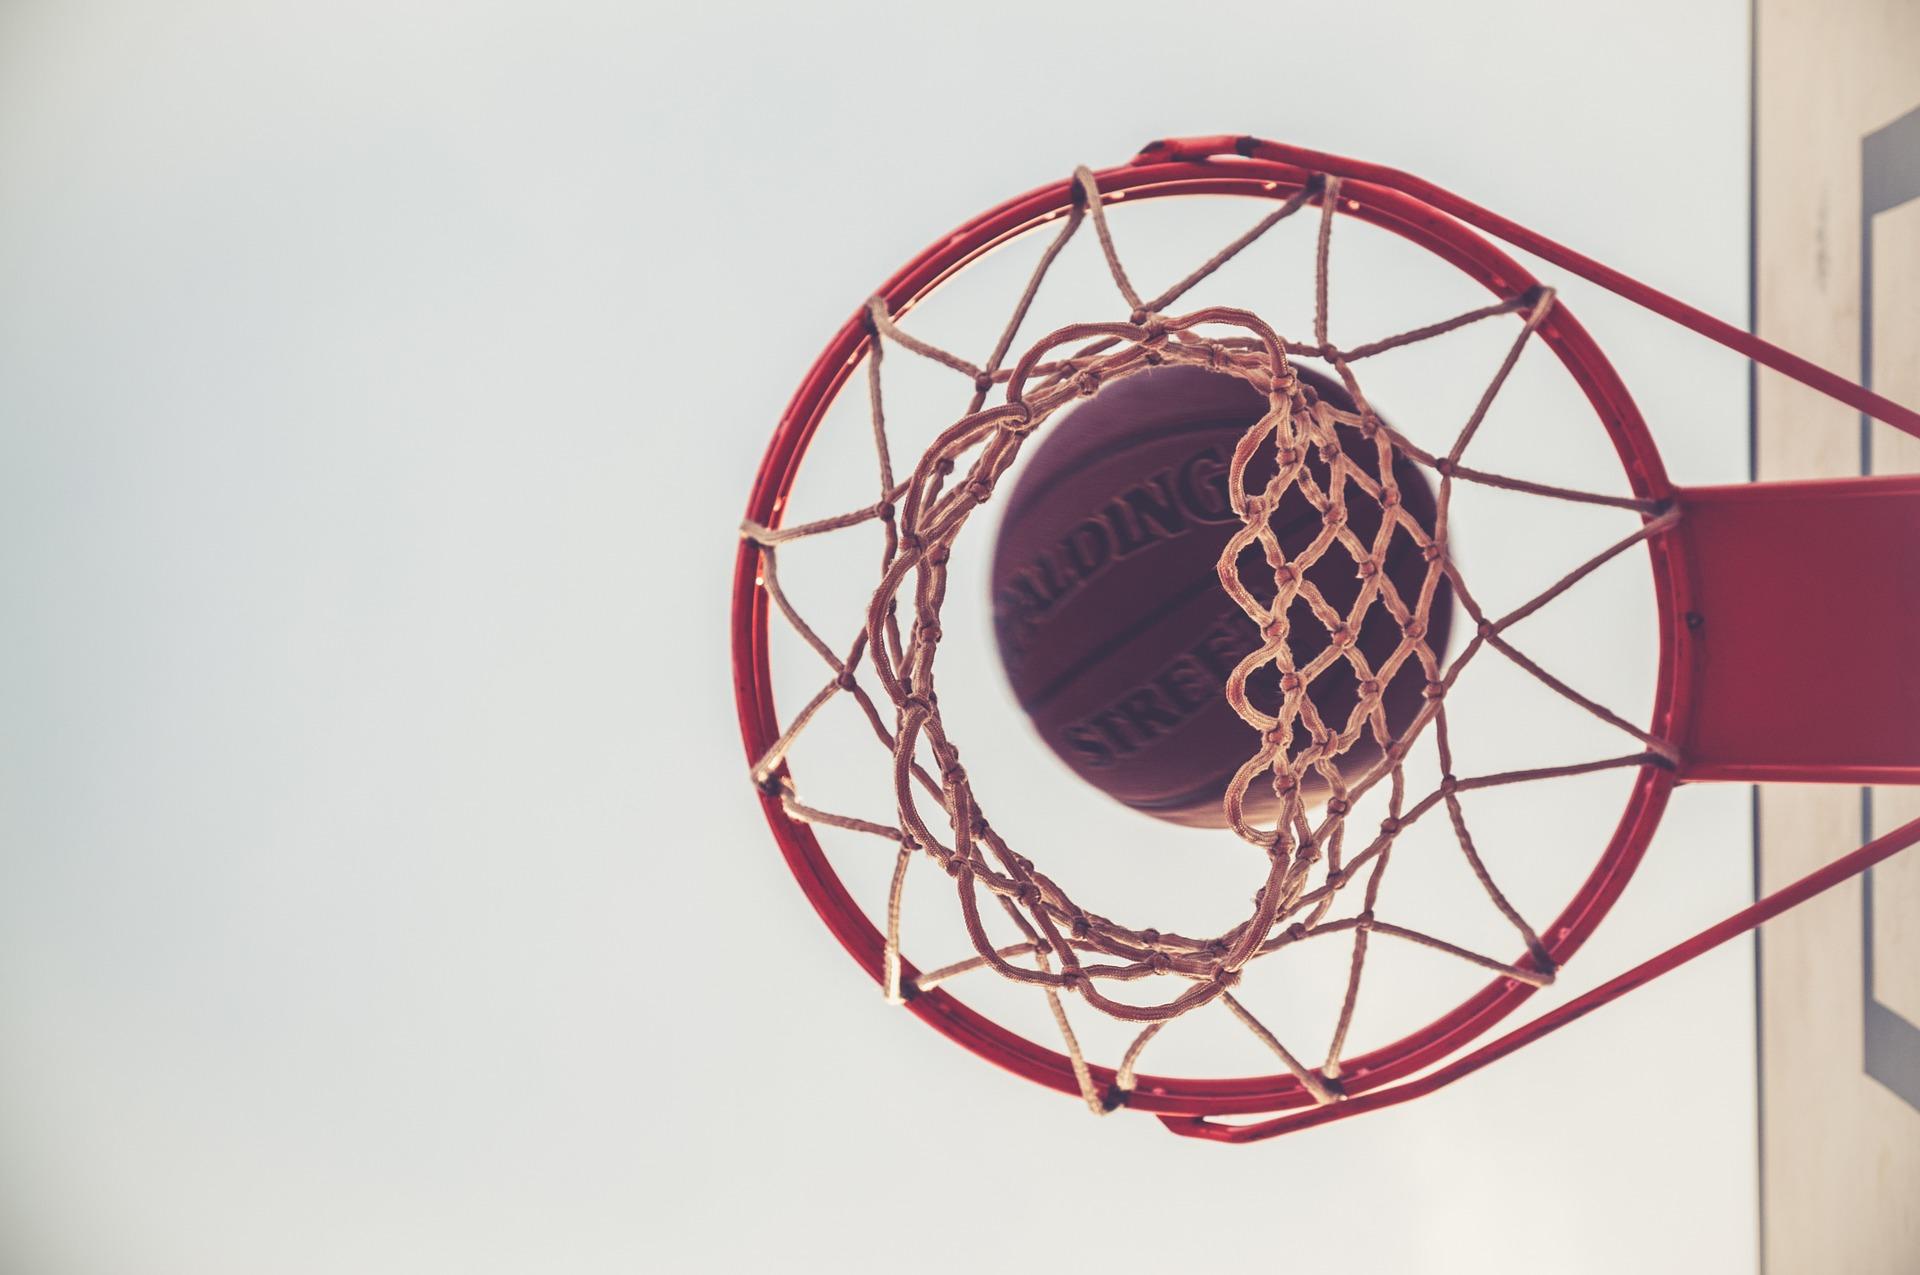 basket-801708_1920.jpg